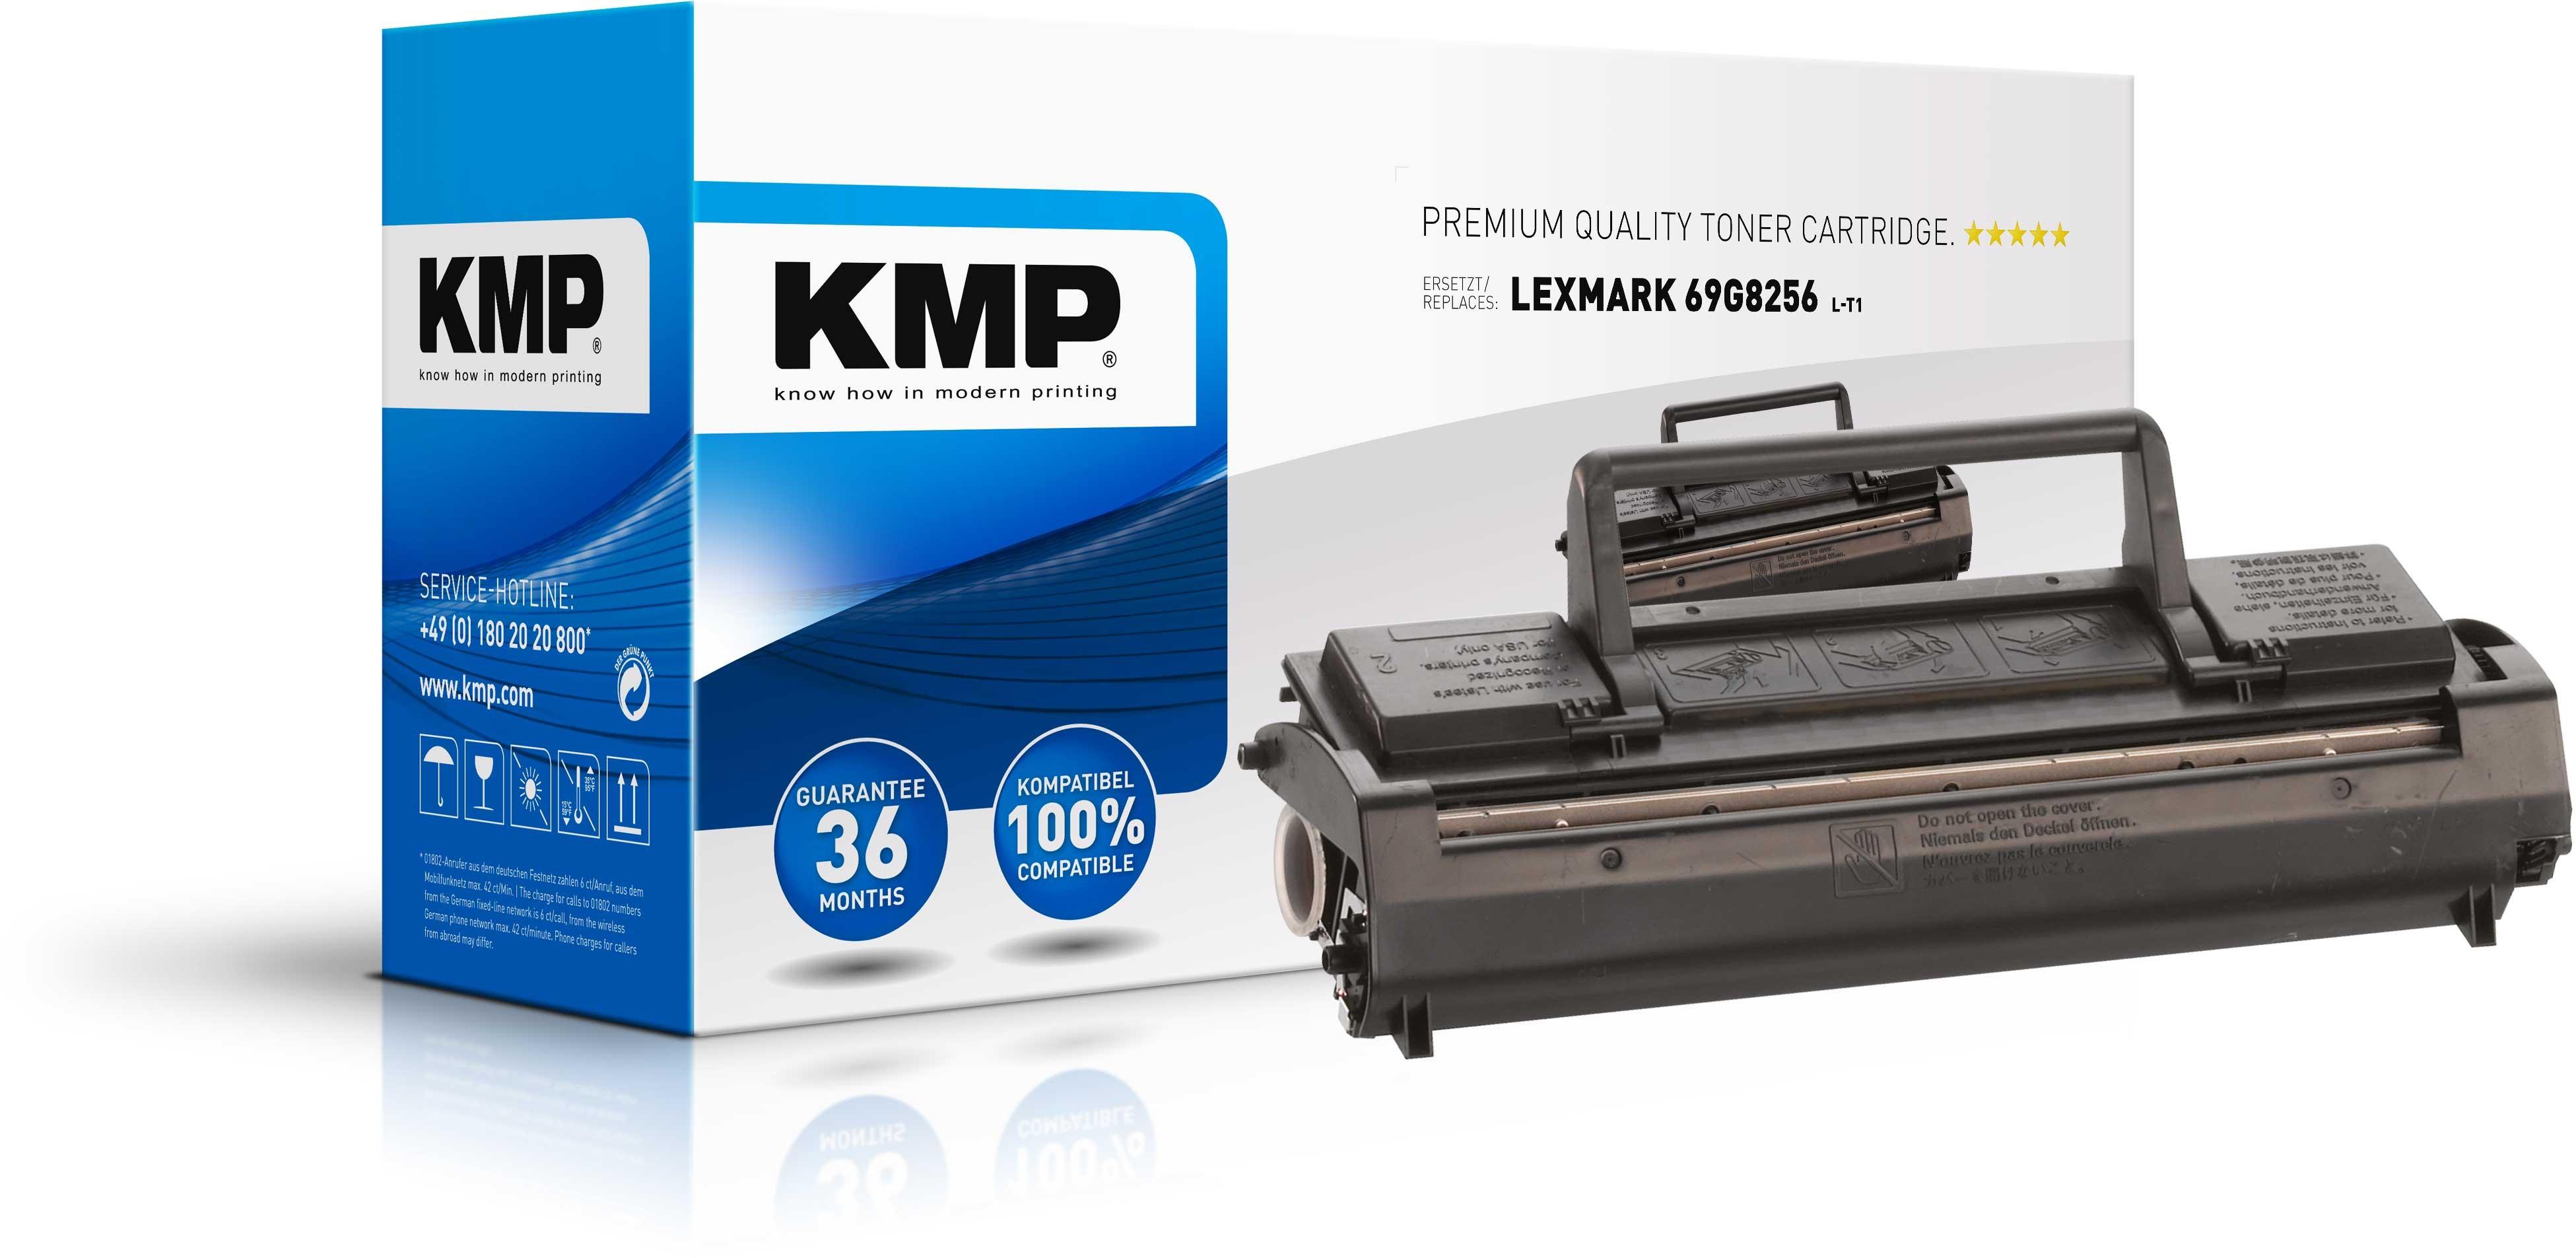 KMP Lexmark Toner für 69G8256 Optra E / Minolta Pagepro 6L / Epson EPL 5500 schwarz L-T1